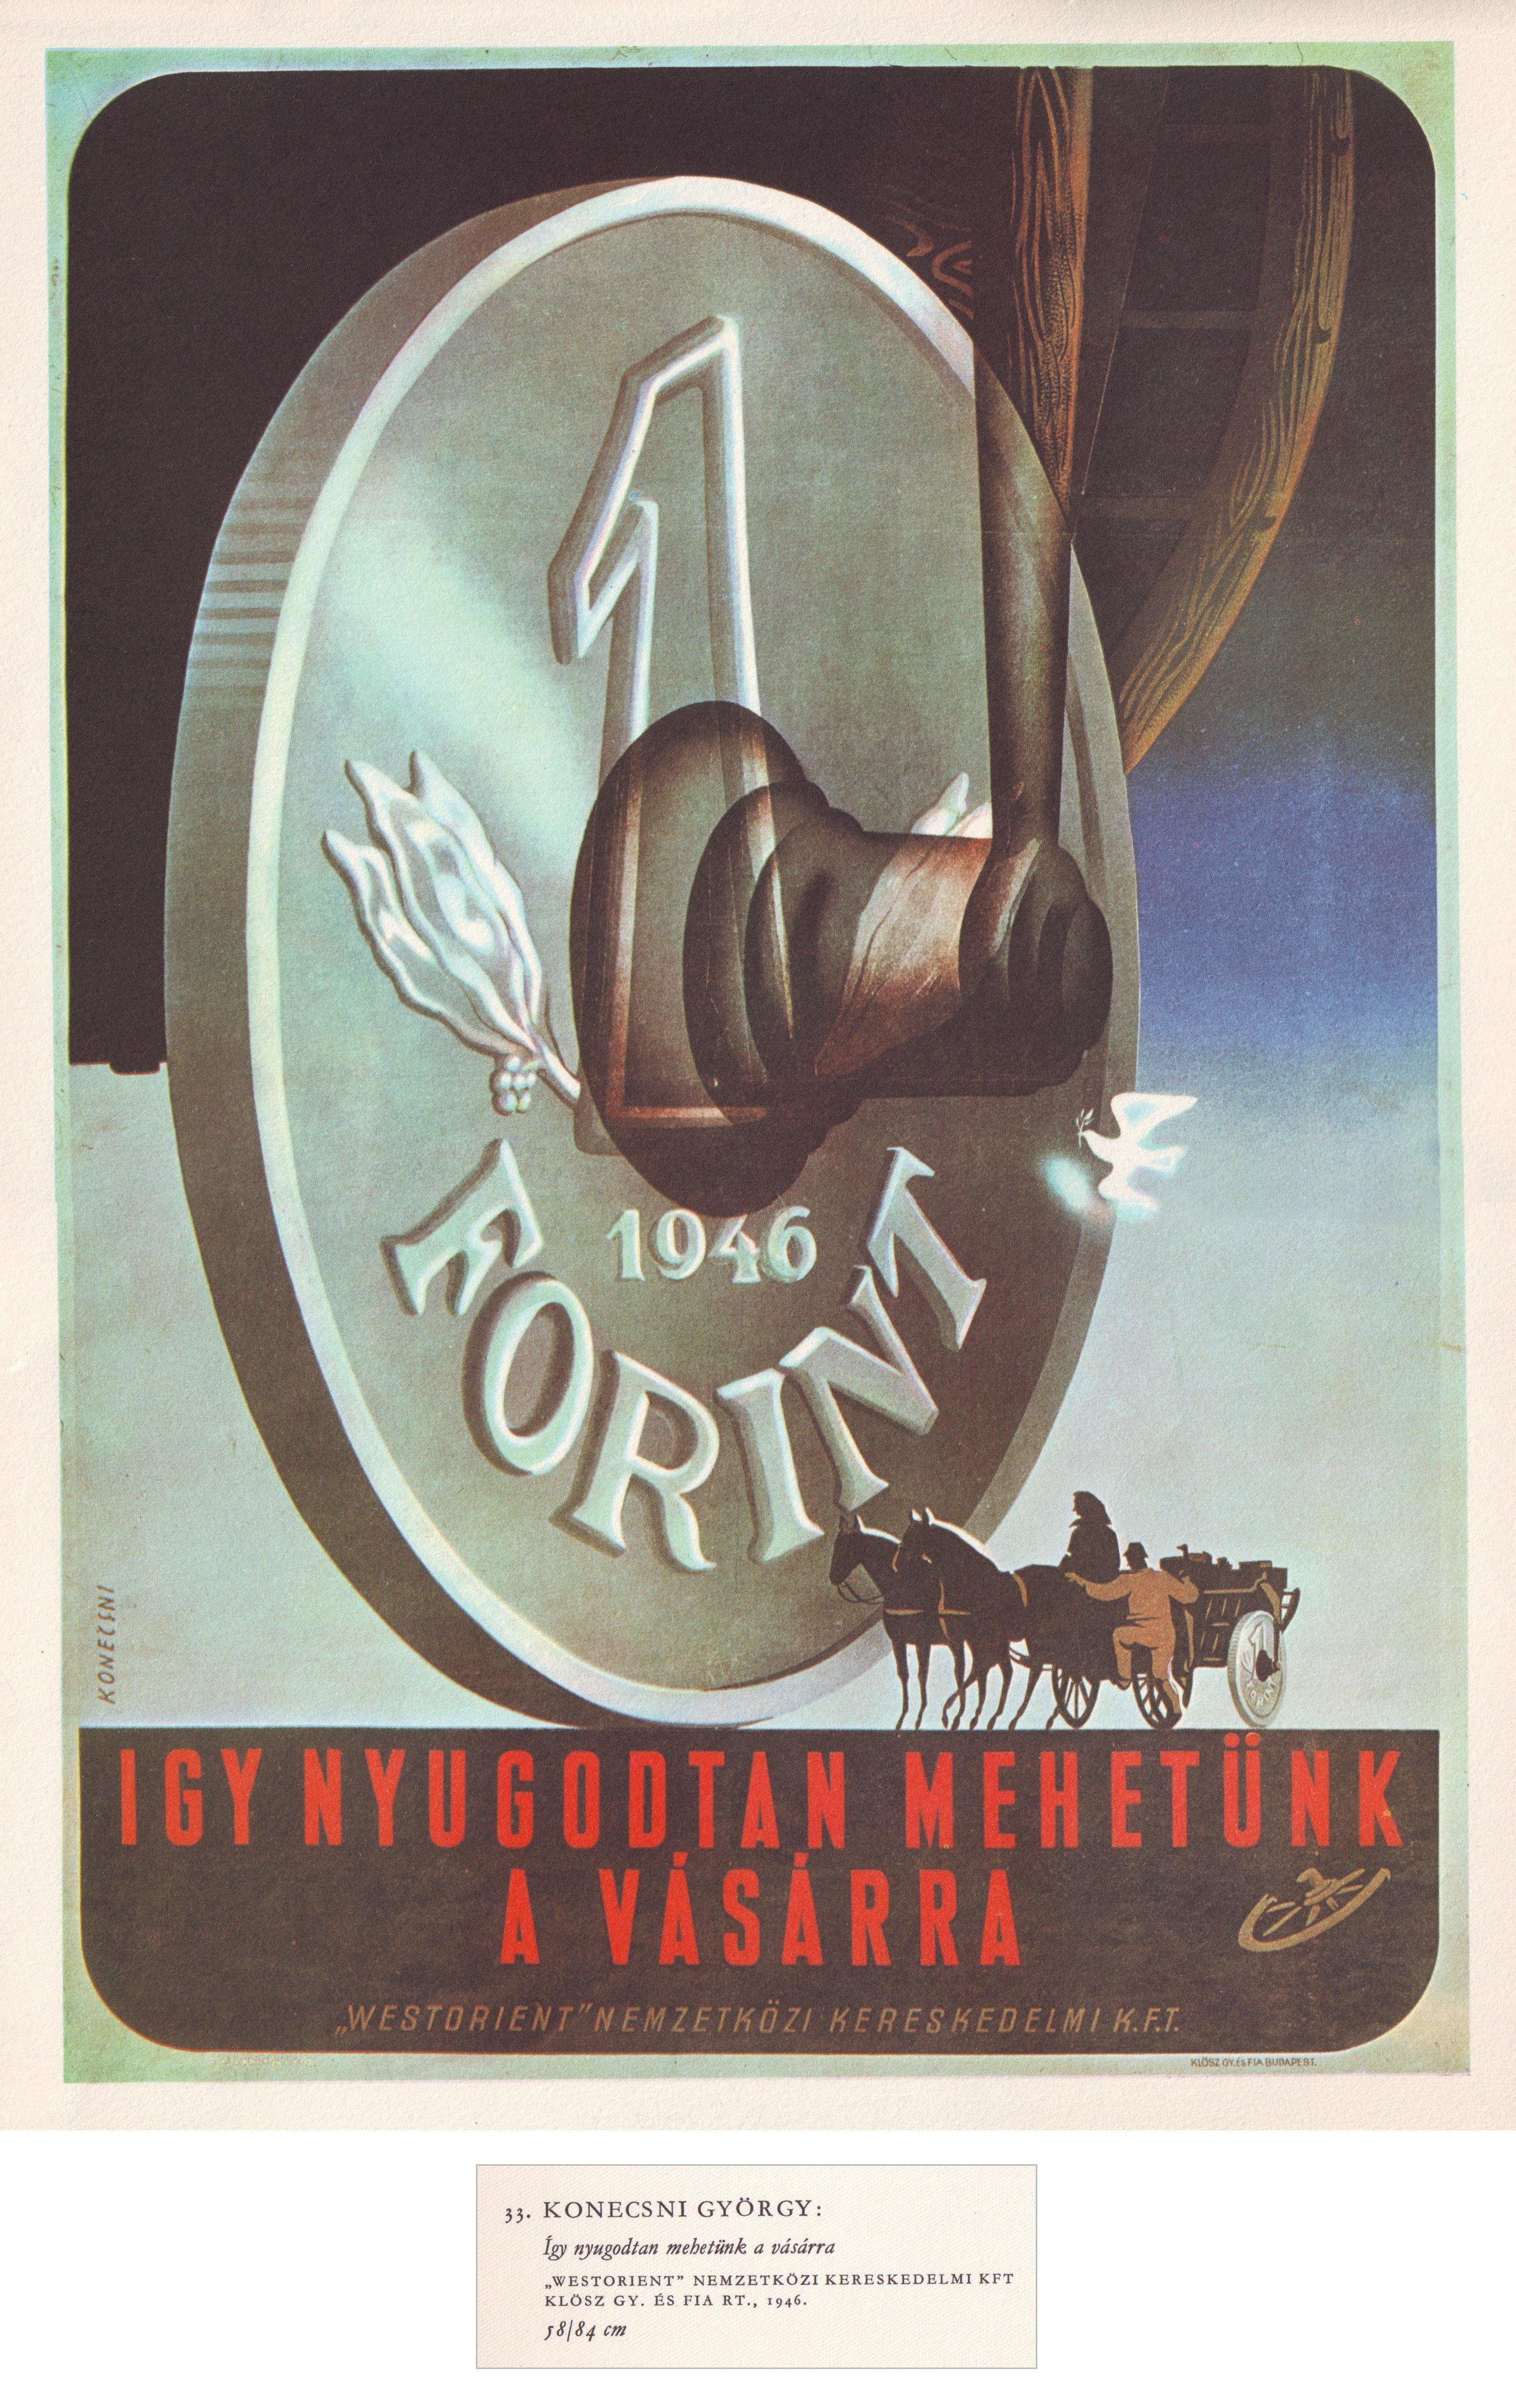 http://www.forintportal.hu/plakat/www_forintportal_hu_1946_igy_nyugodtan_mehetunk_a_vasarra_plaka_reprint_nagy.jpg